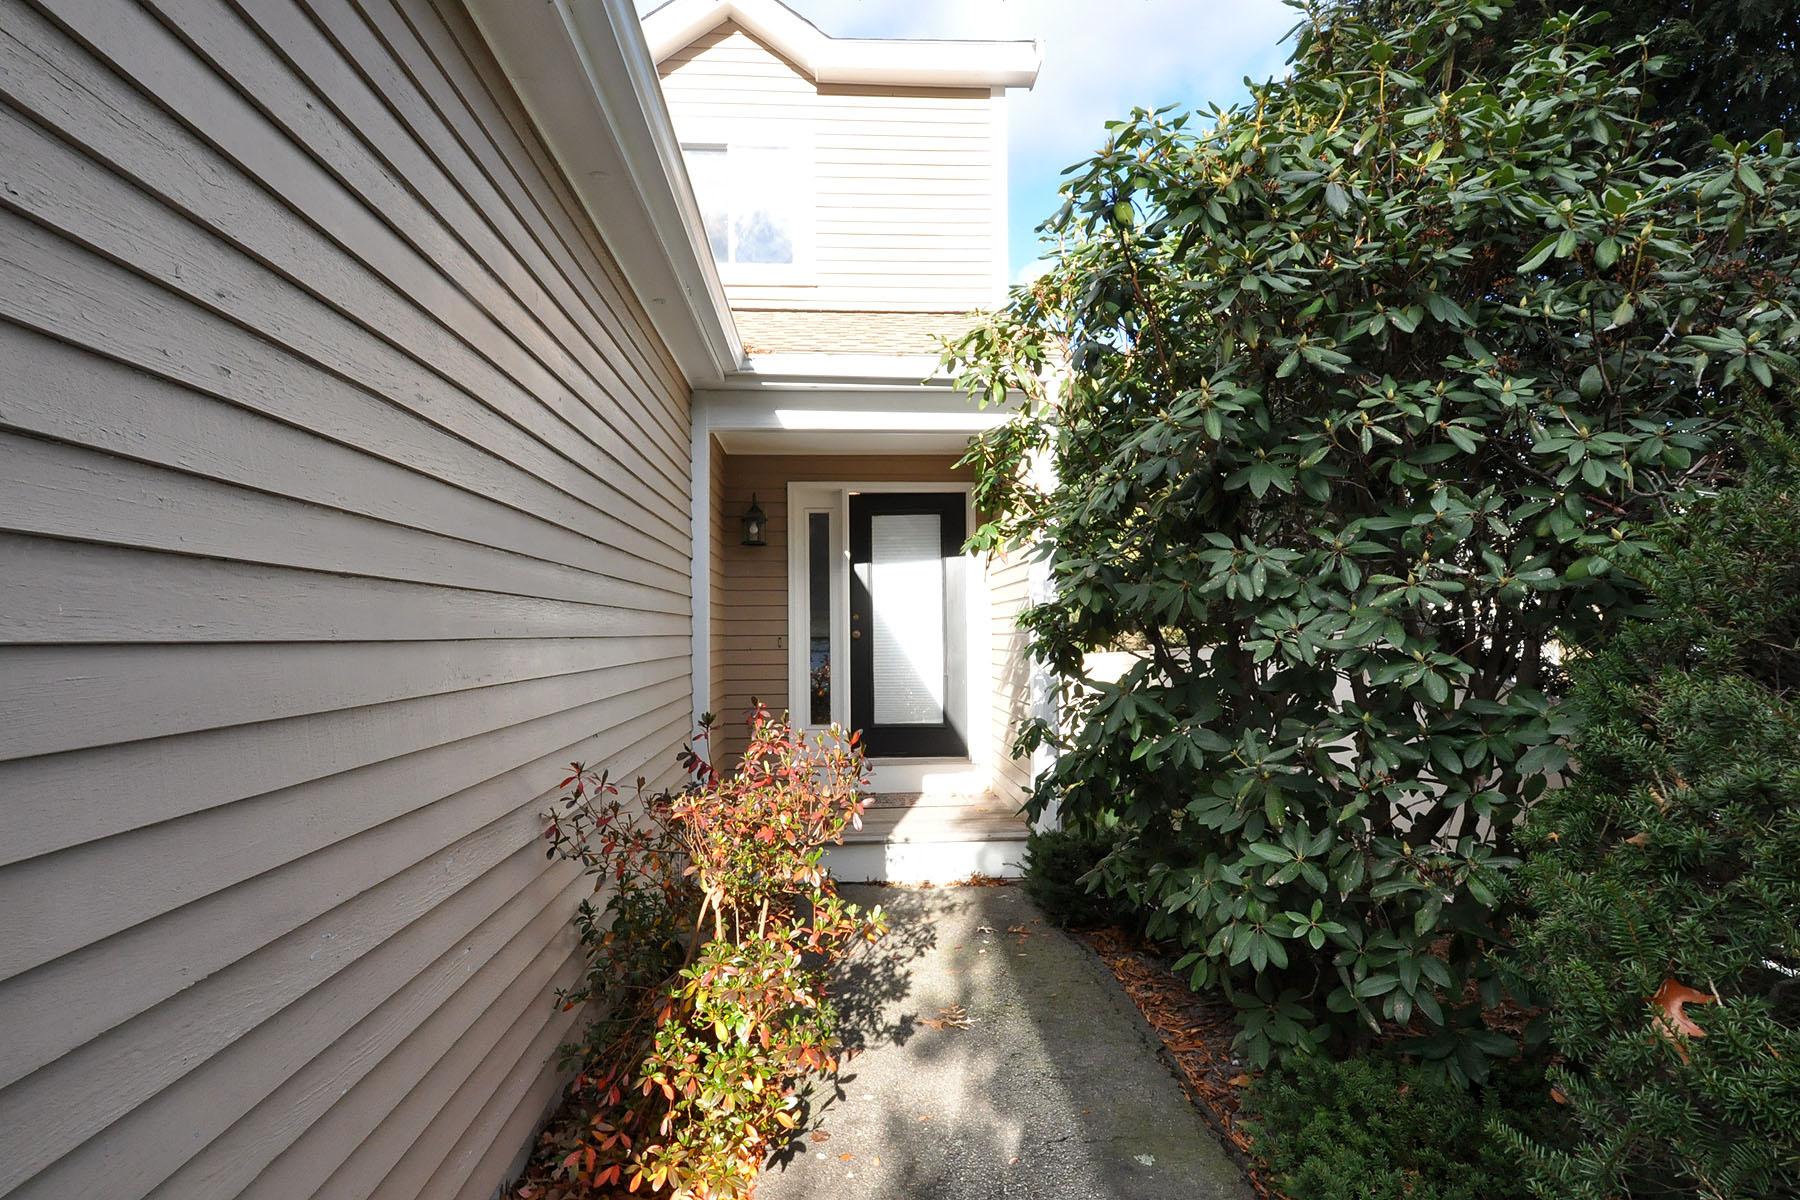 Property For Sale at 11 Lanes End, Unit 11